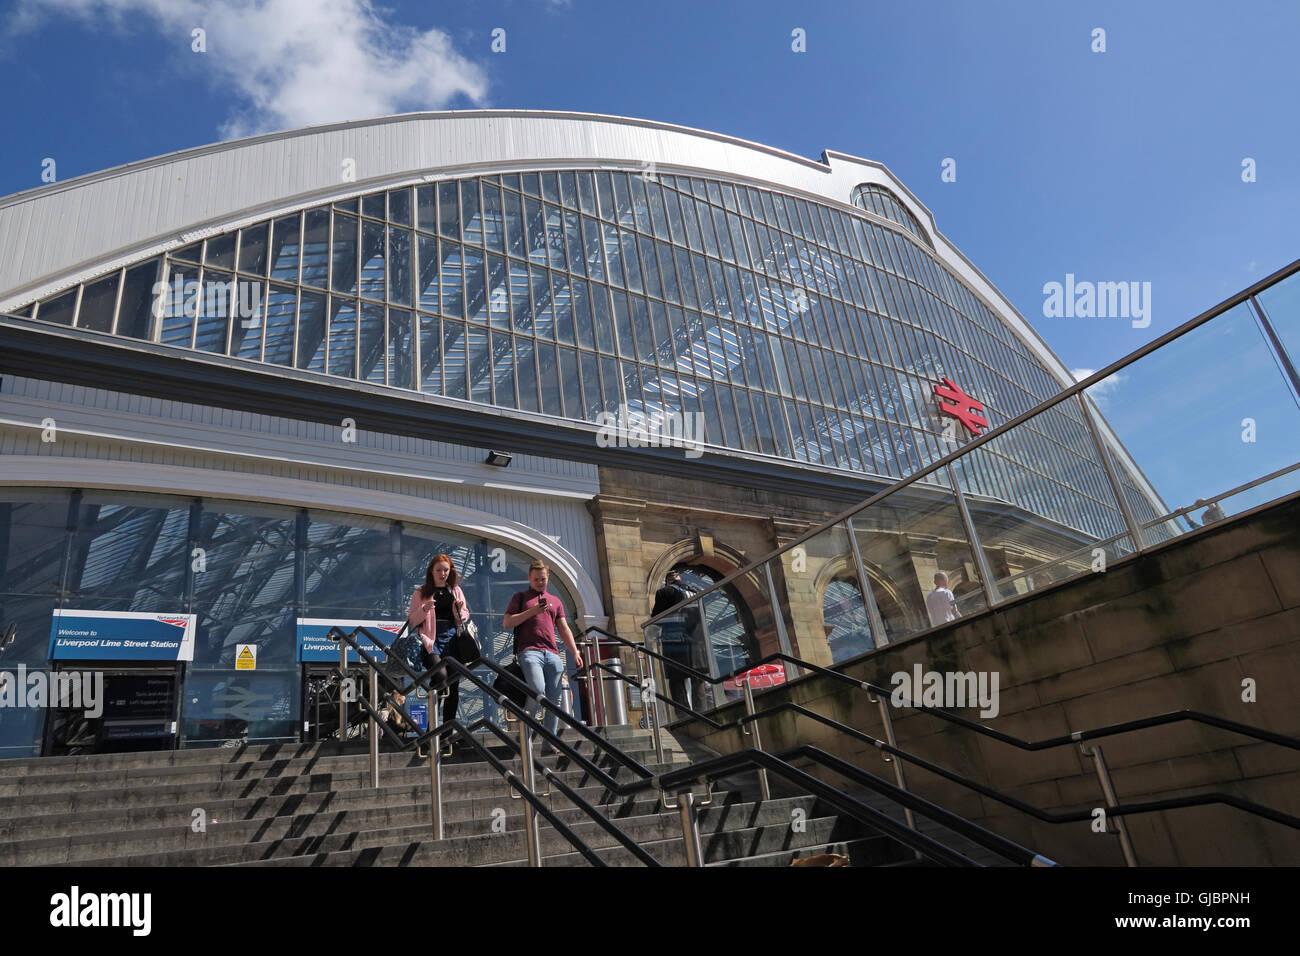 Laden Sie dieses Alamy Stockfoto Liverpool Lime Street, Bahnhof, Stadtzentrum Liverpool, Merseyside, England - GJBPNH